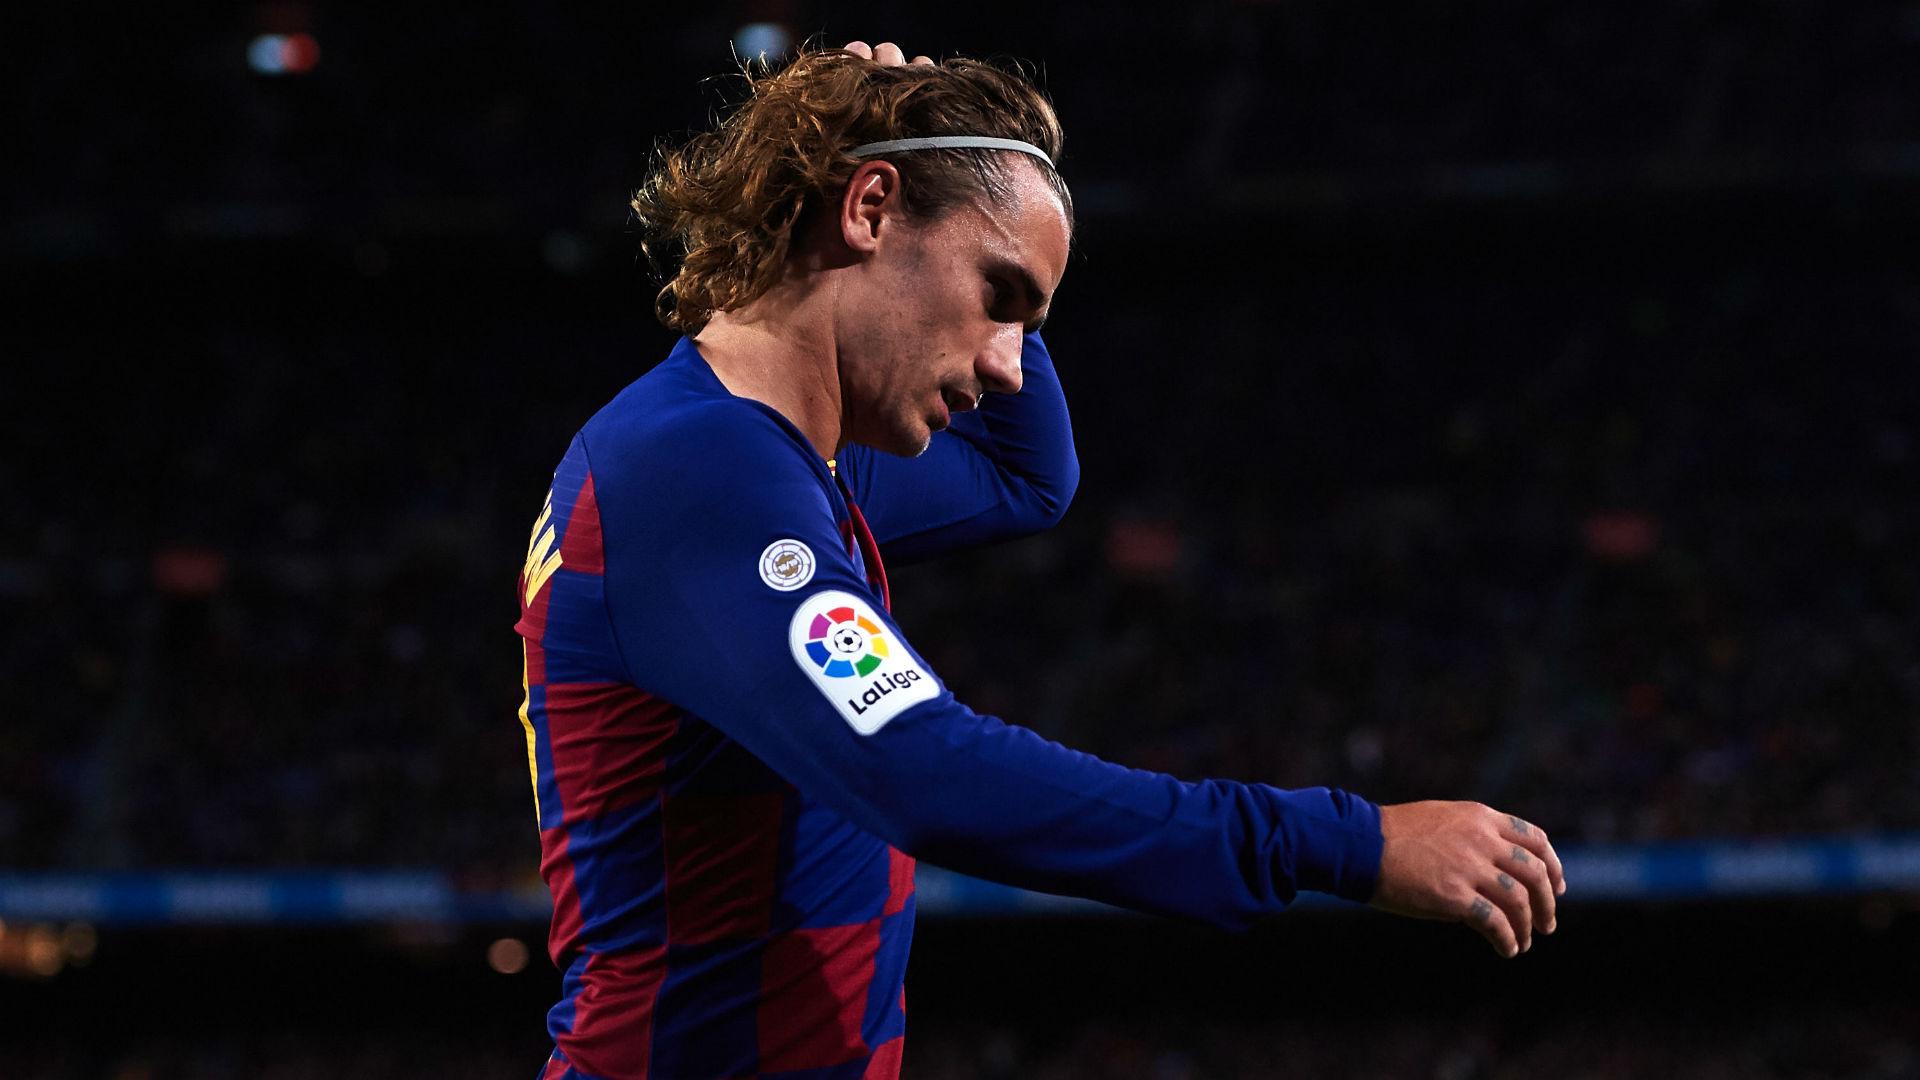 Atletico Madrid v Barcelona: Griezmann's negative impact highlighted ahead of Wanda return